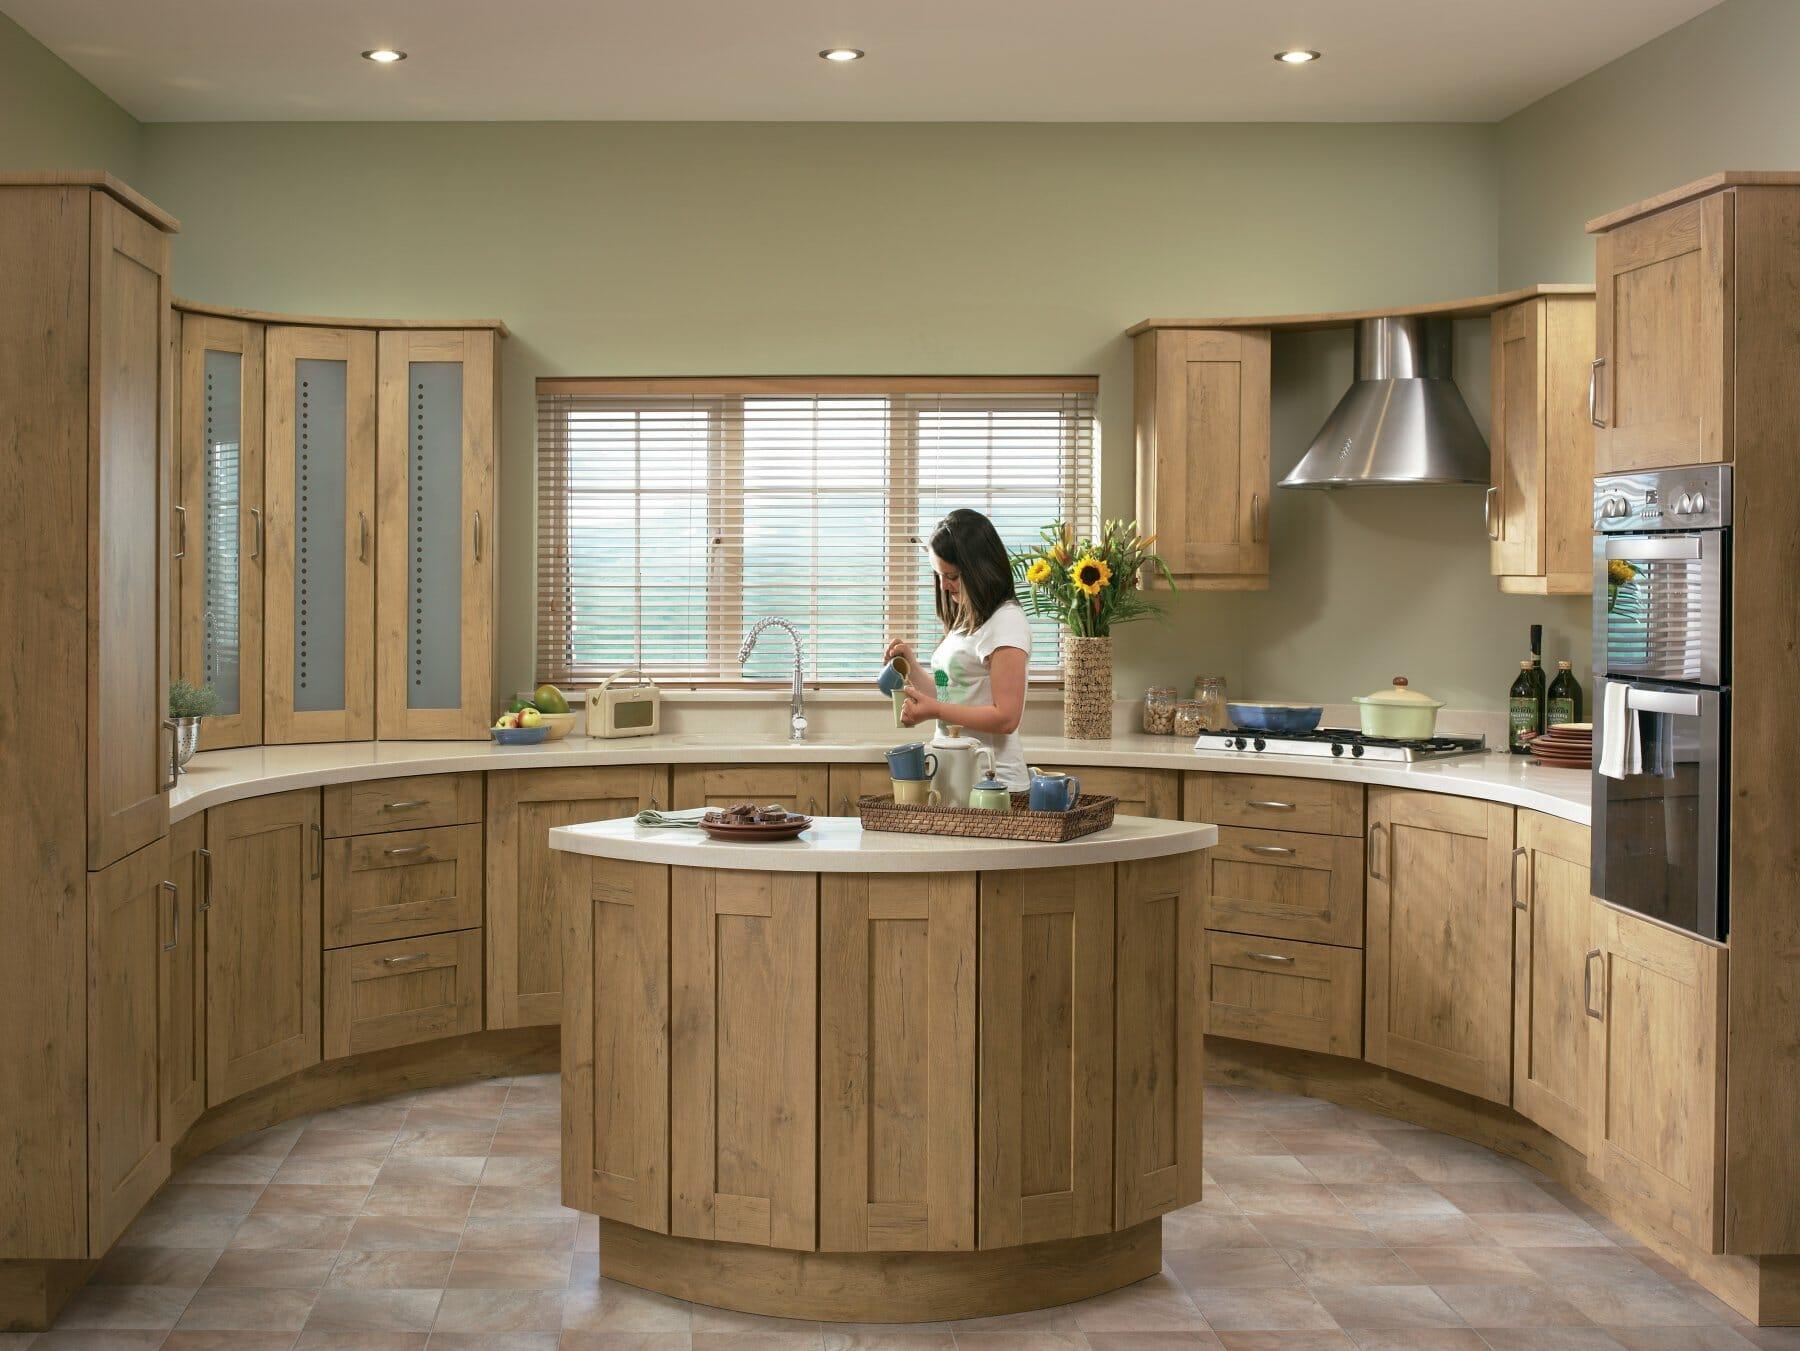 Kitchens mastercraft kitchens for Oak kitchen ideas